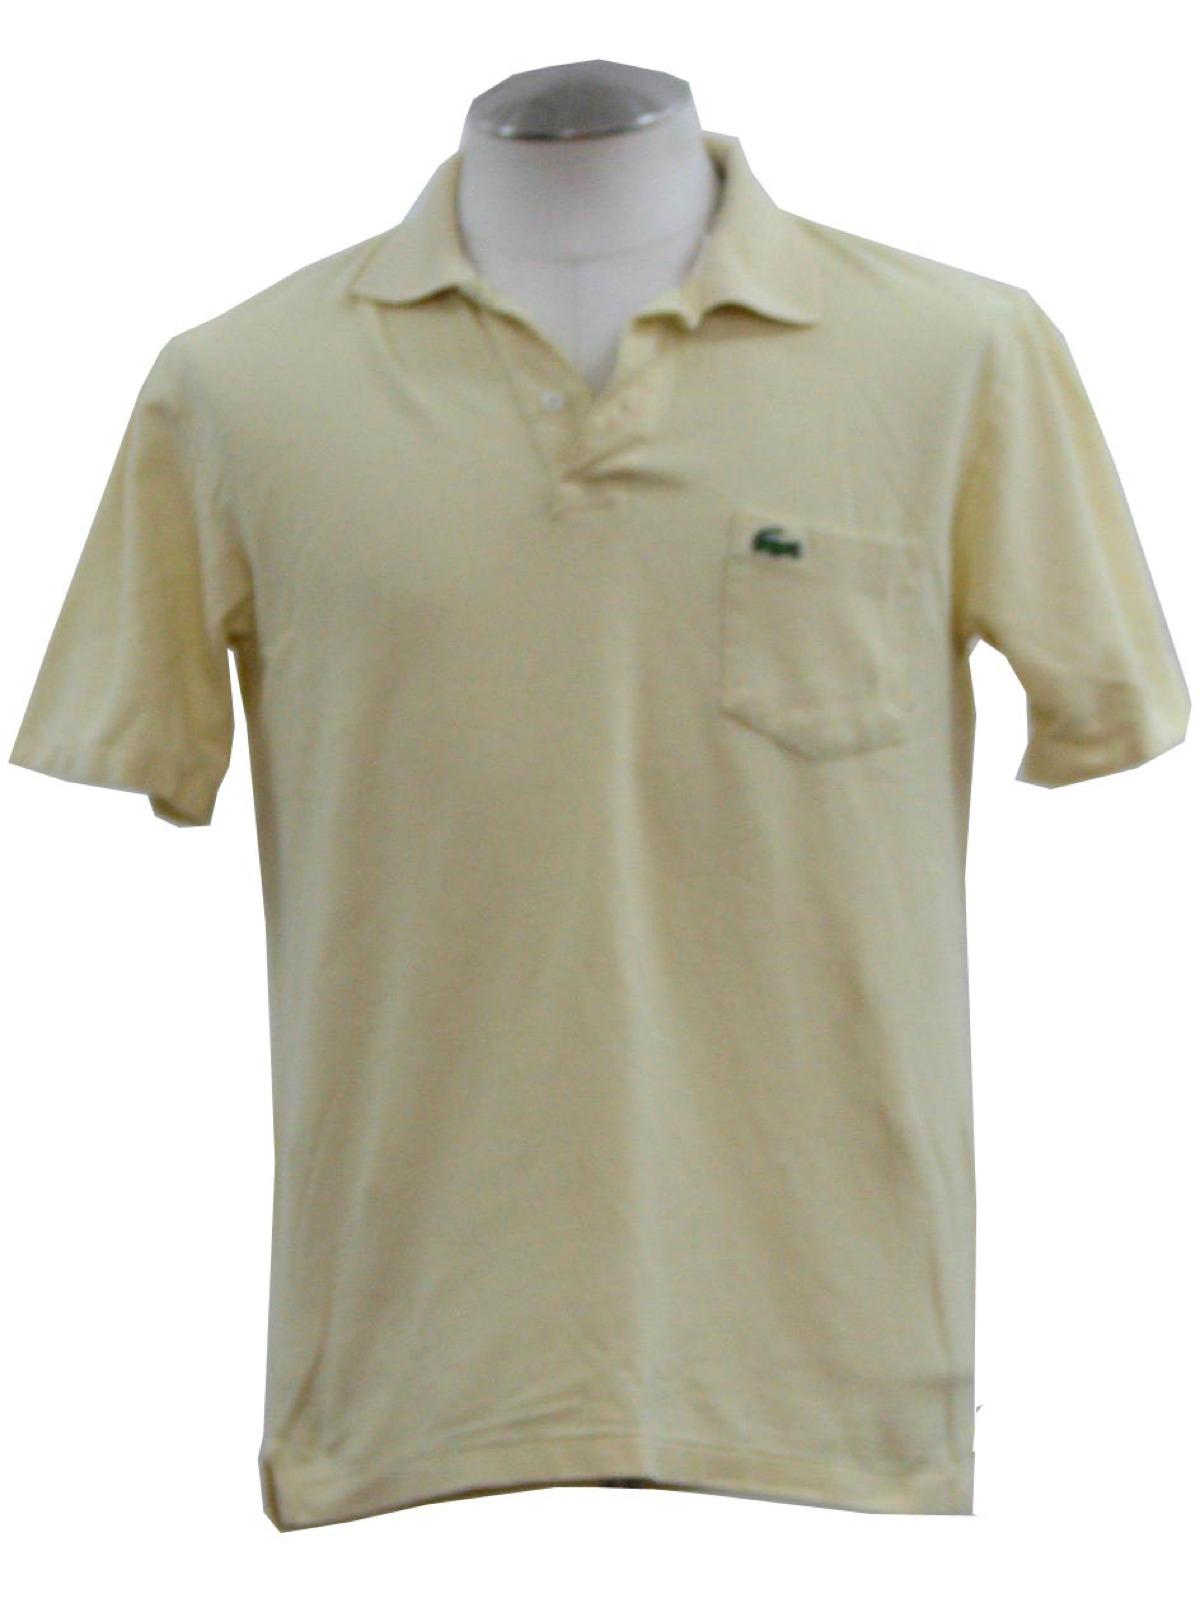 Izod Eighties Vintage Shirt 80s Izod Mens Soft Yellow Woven